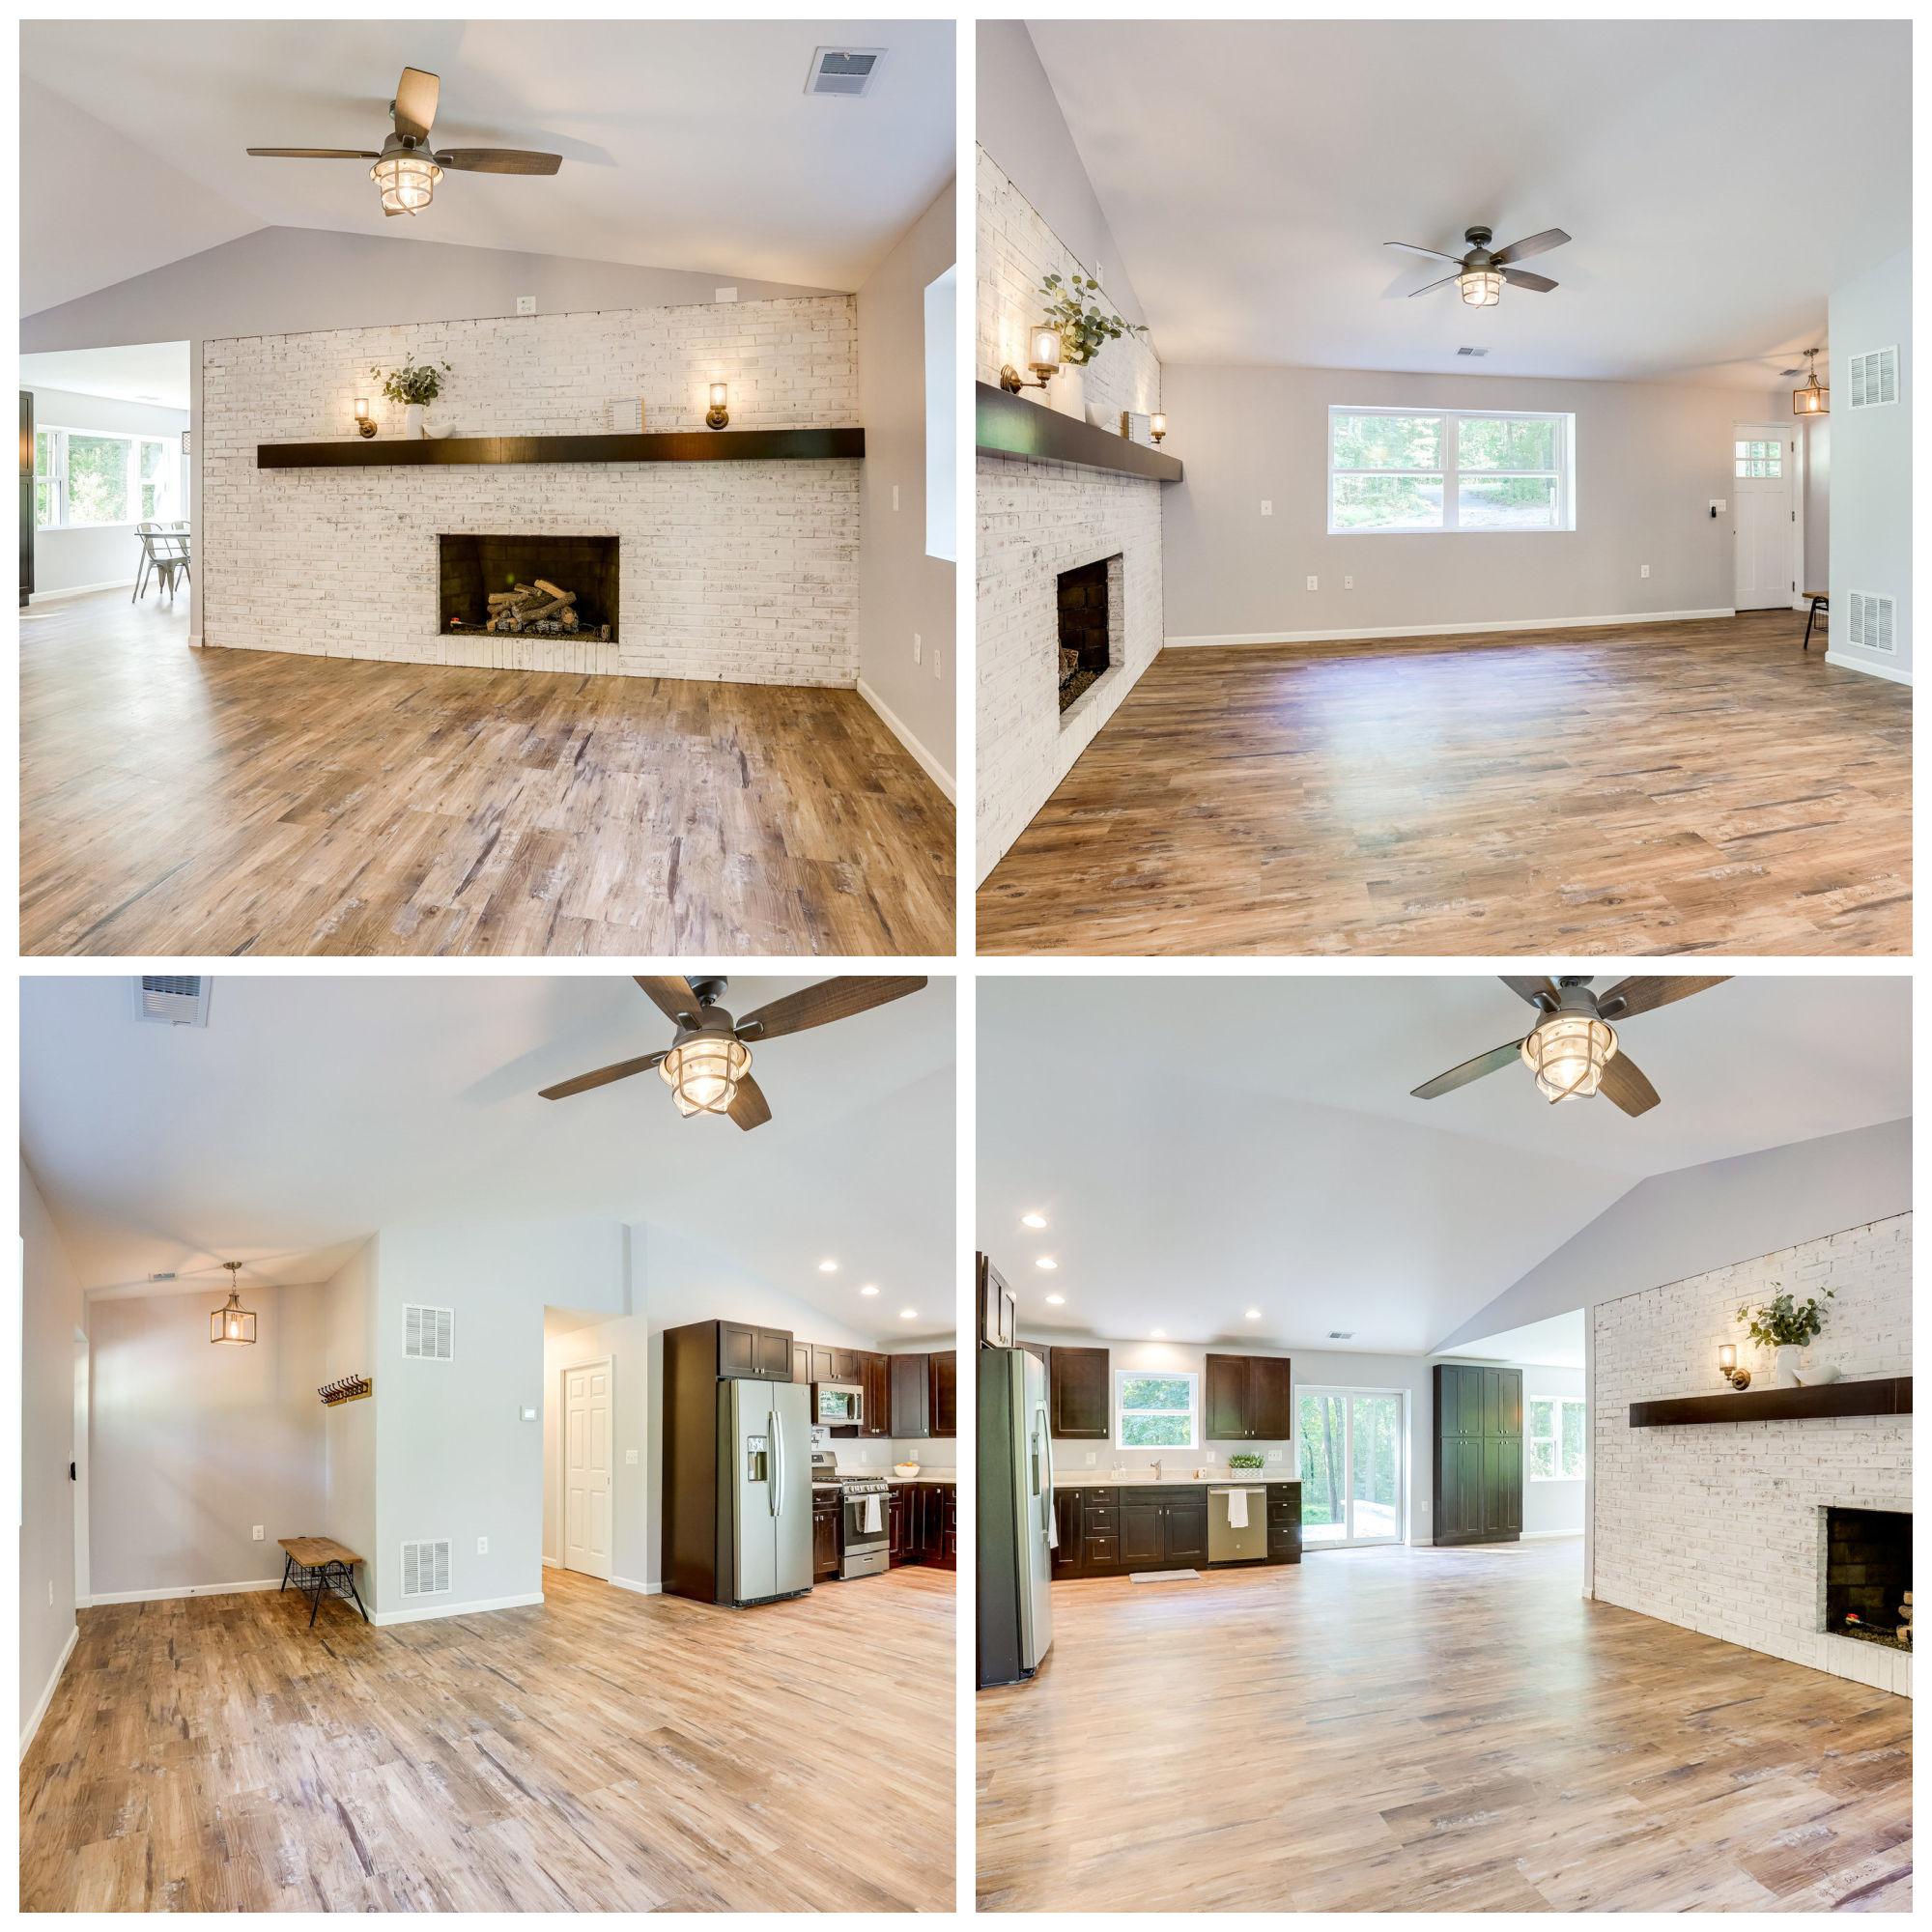 584 Aaron Mountain Rd, Castleton- Living Room